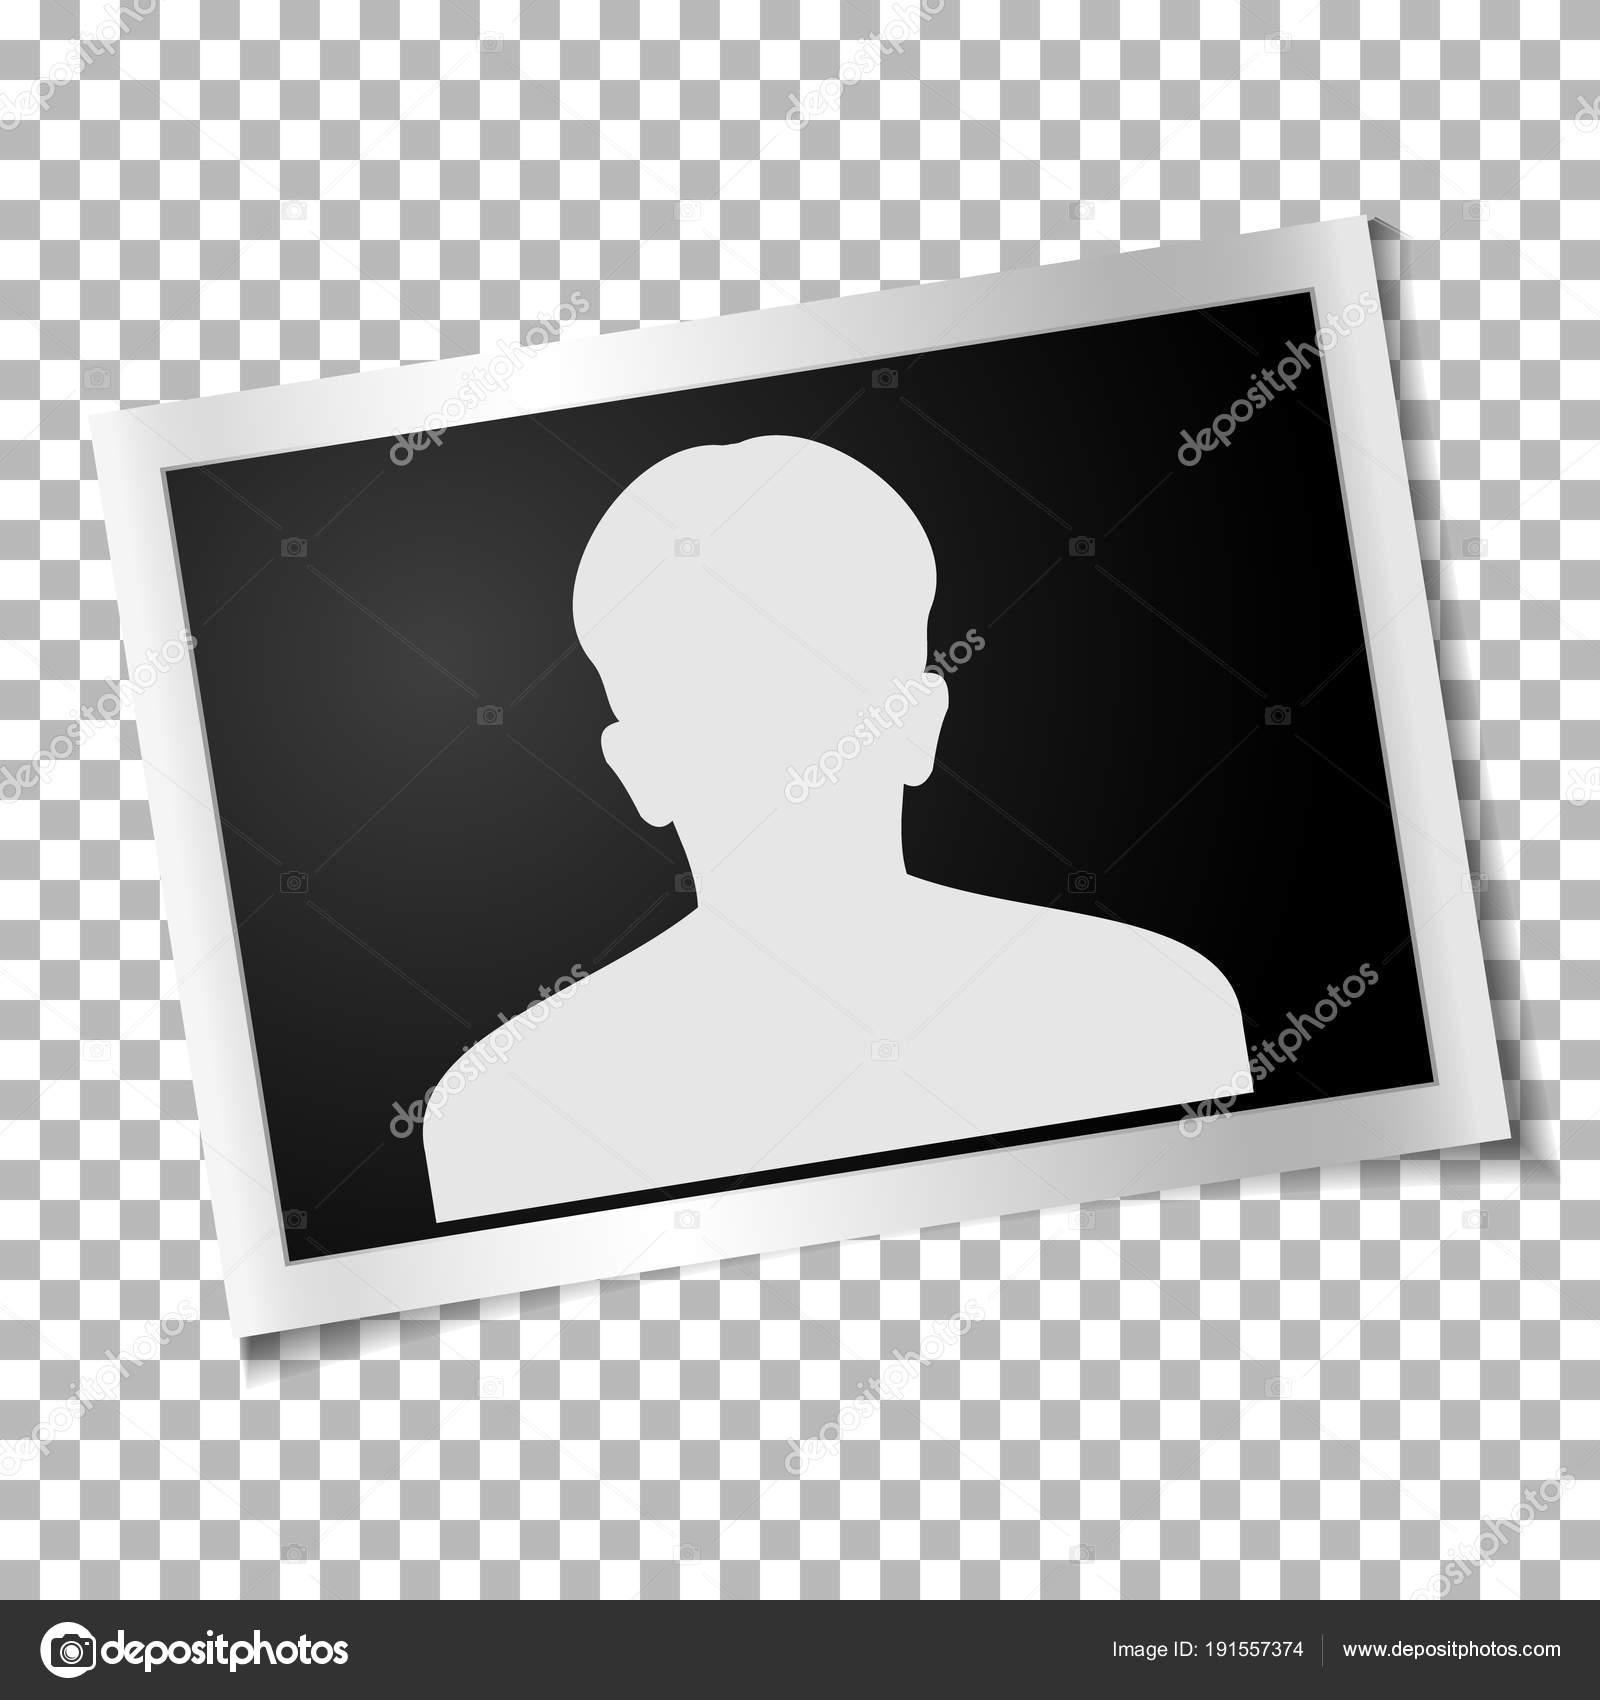 Frame retro photo on transparent background. Horizontal blank old ...